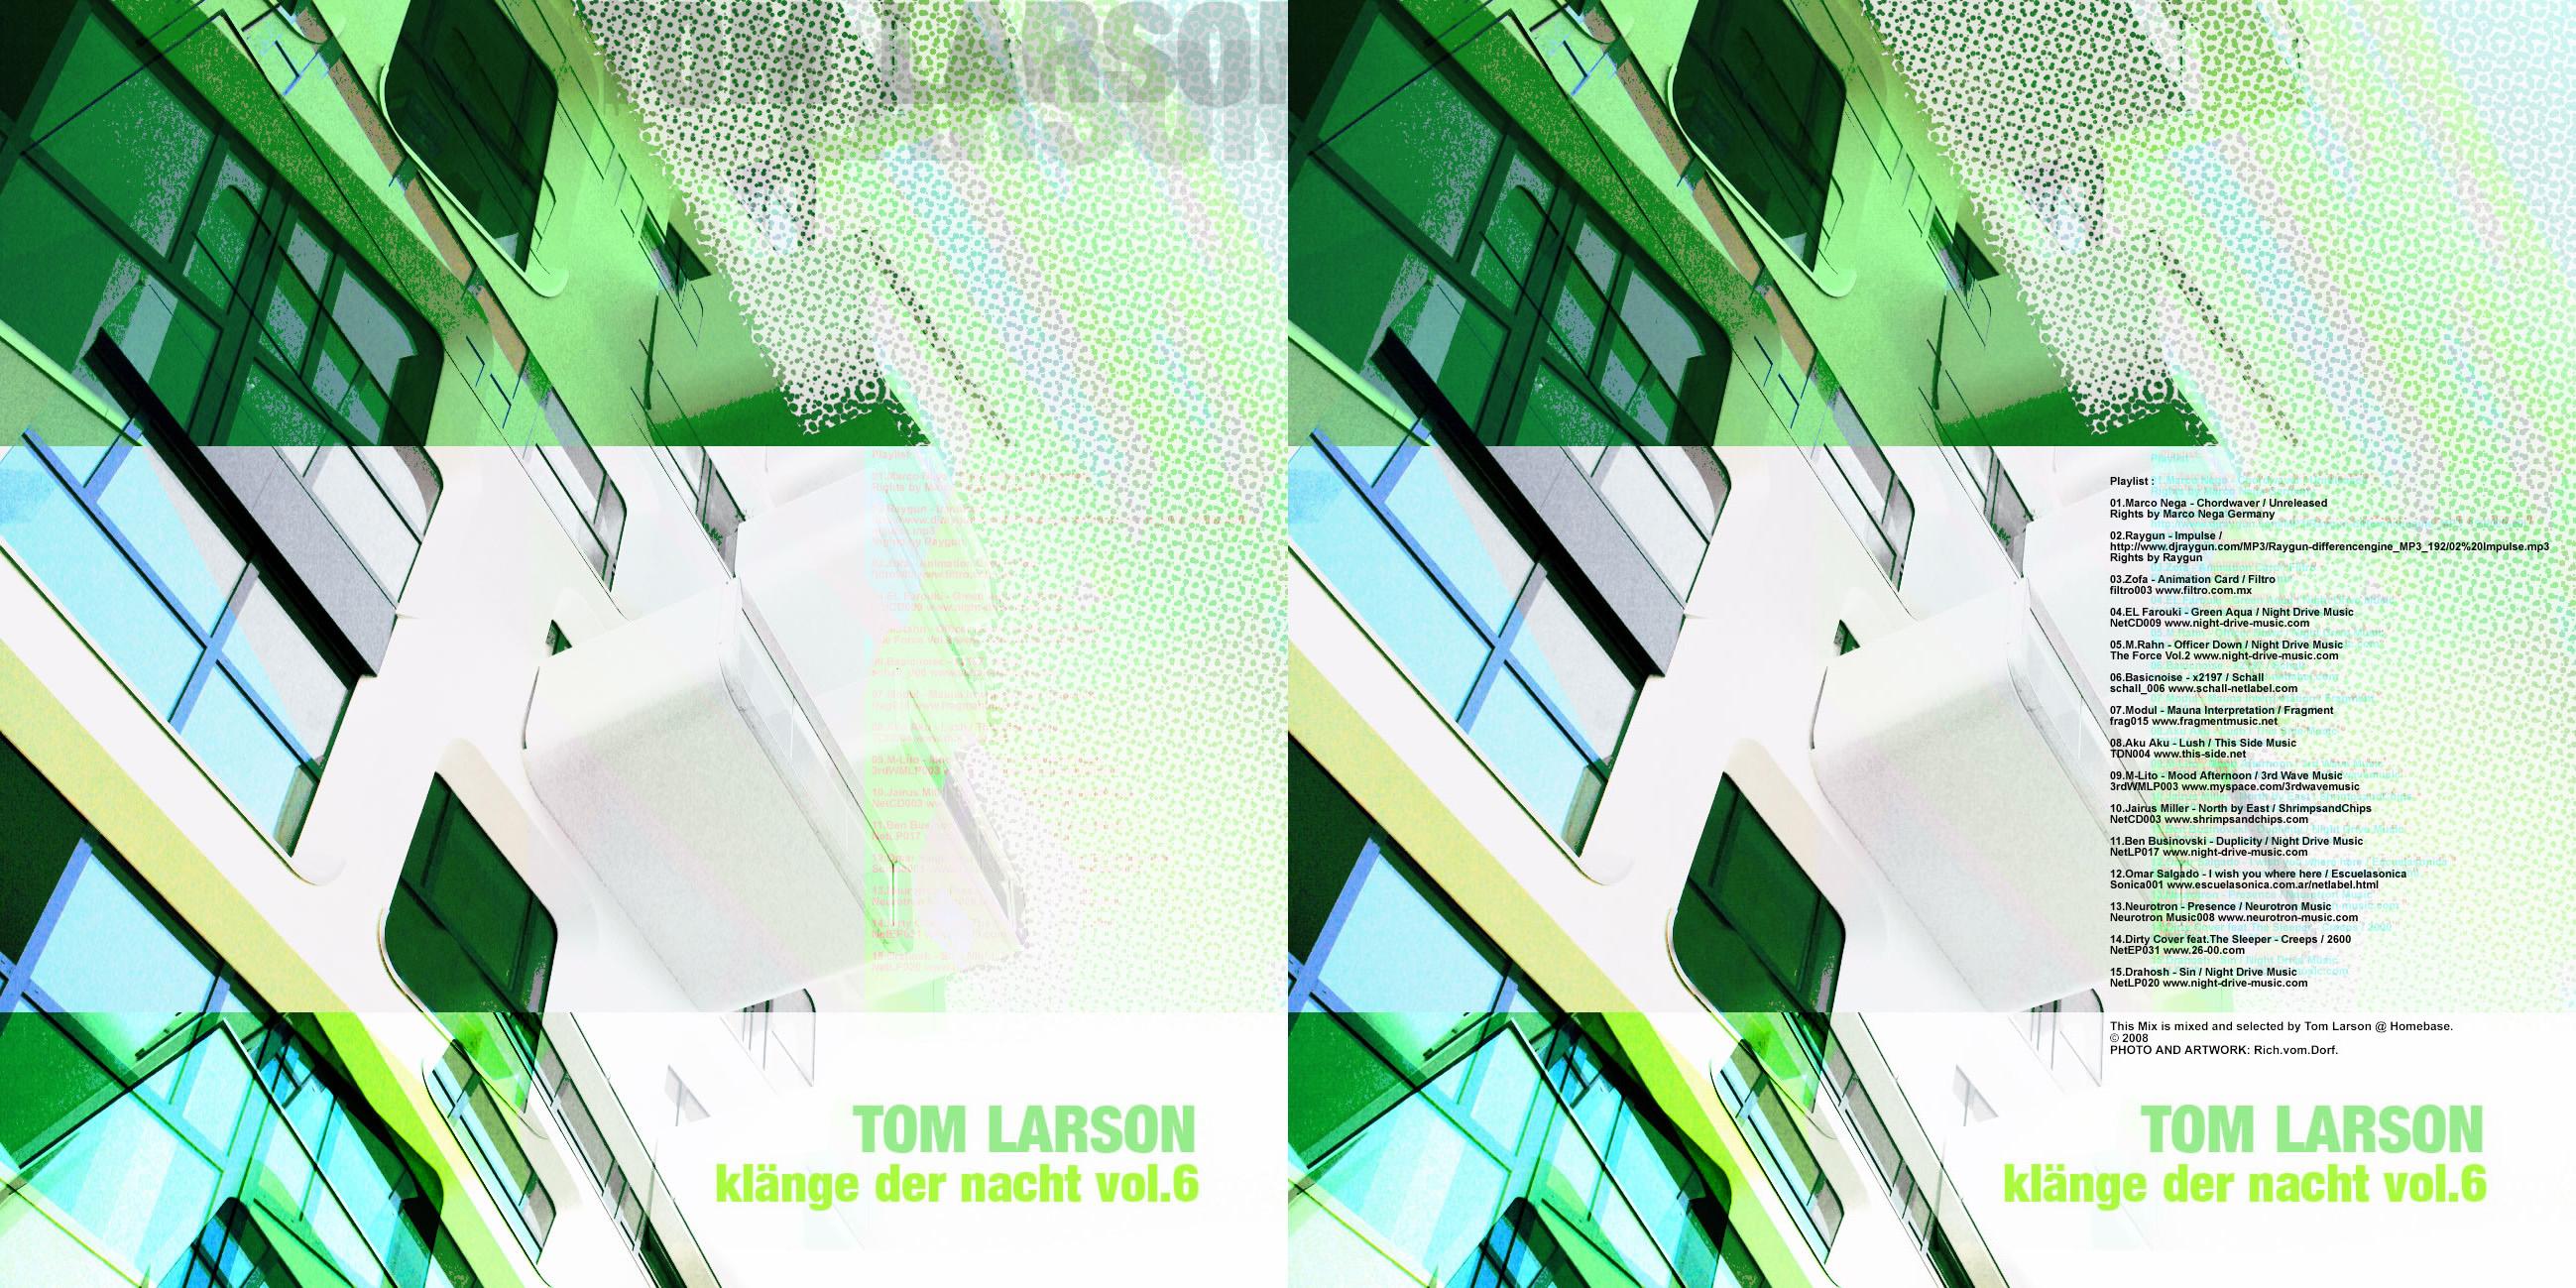 http://www.mixotic.net/mixes/137_-_Tom_Larson_-_Klaenge_der_Nacht_Vol_6/cover_large.jpg